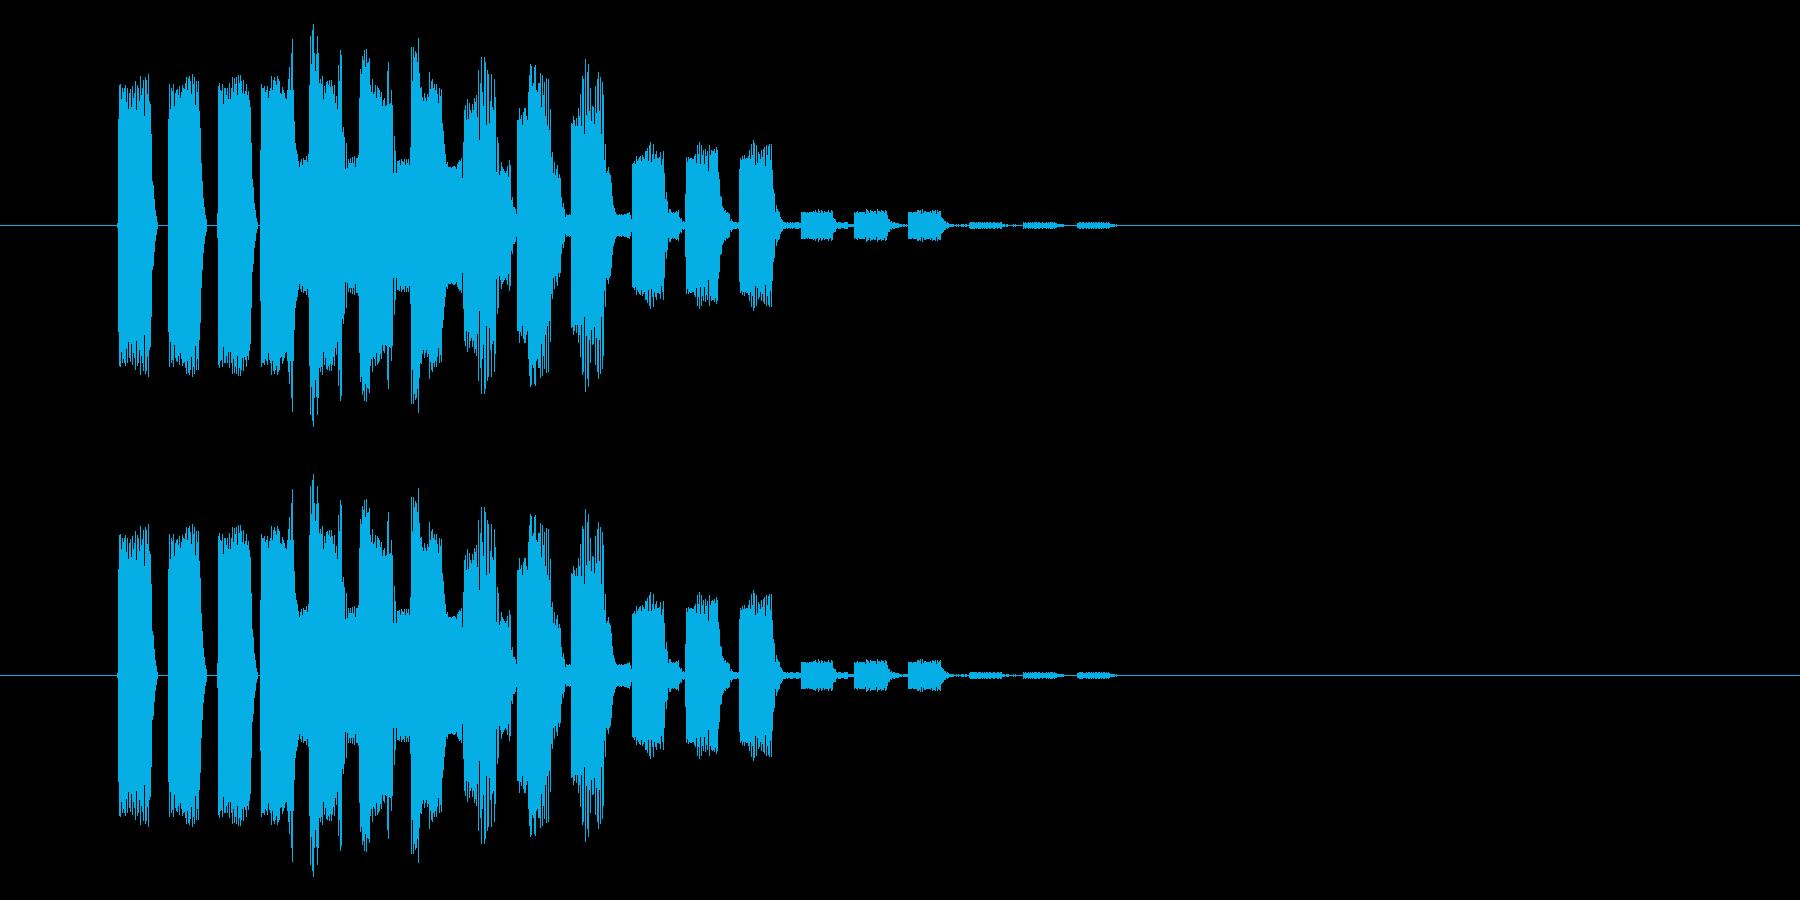 SNES-RPG04-12(魔法 回復)の再生済みの波形